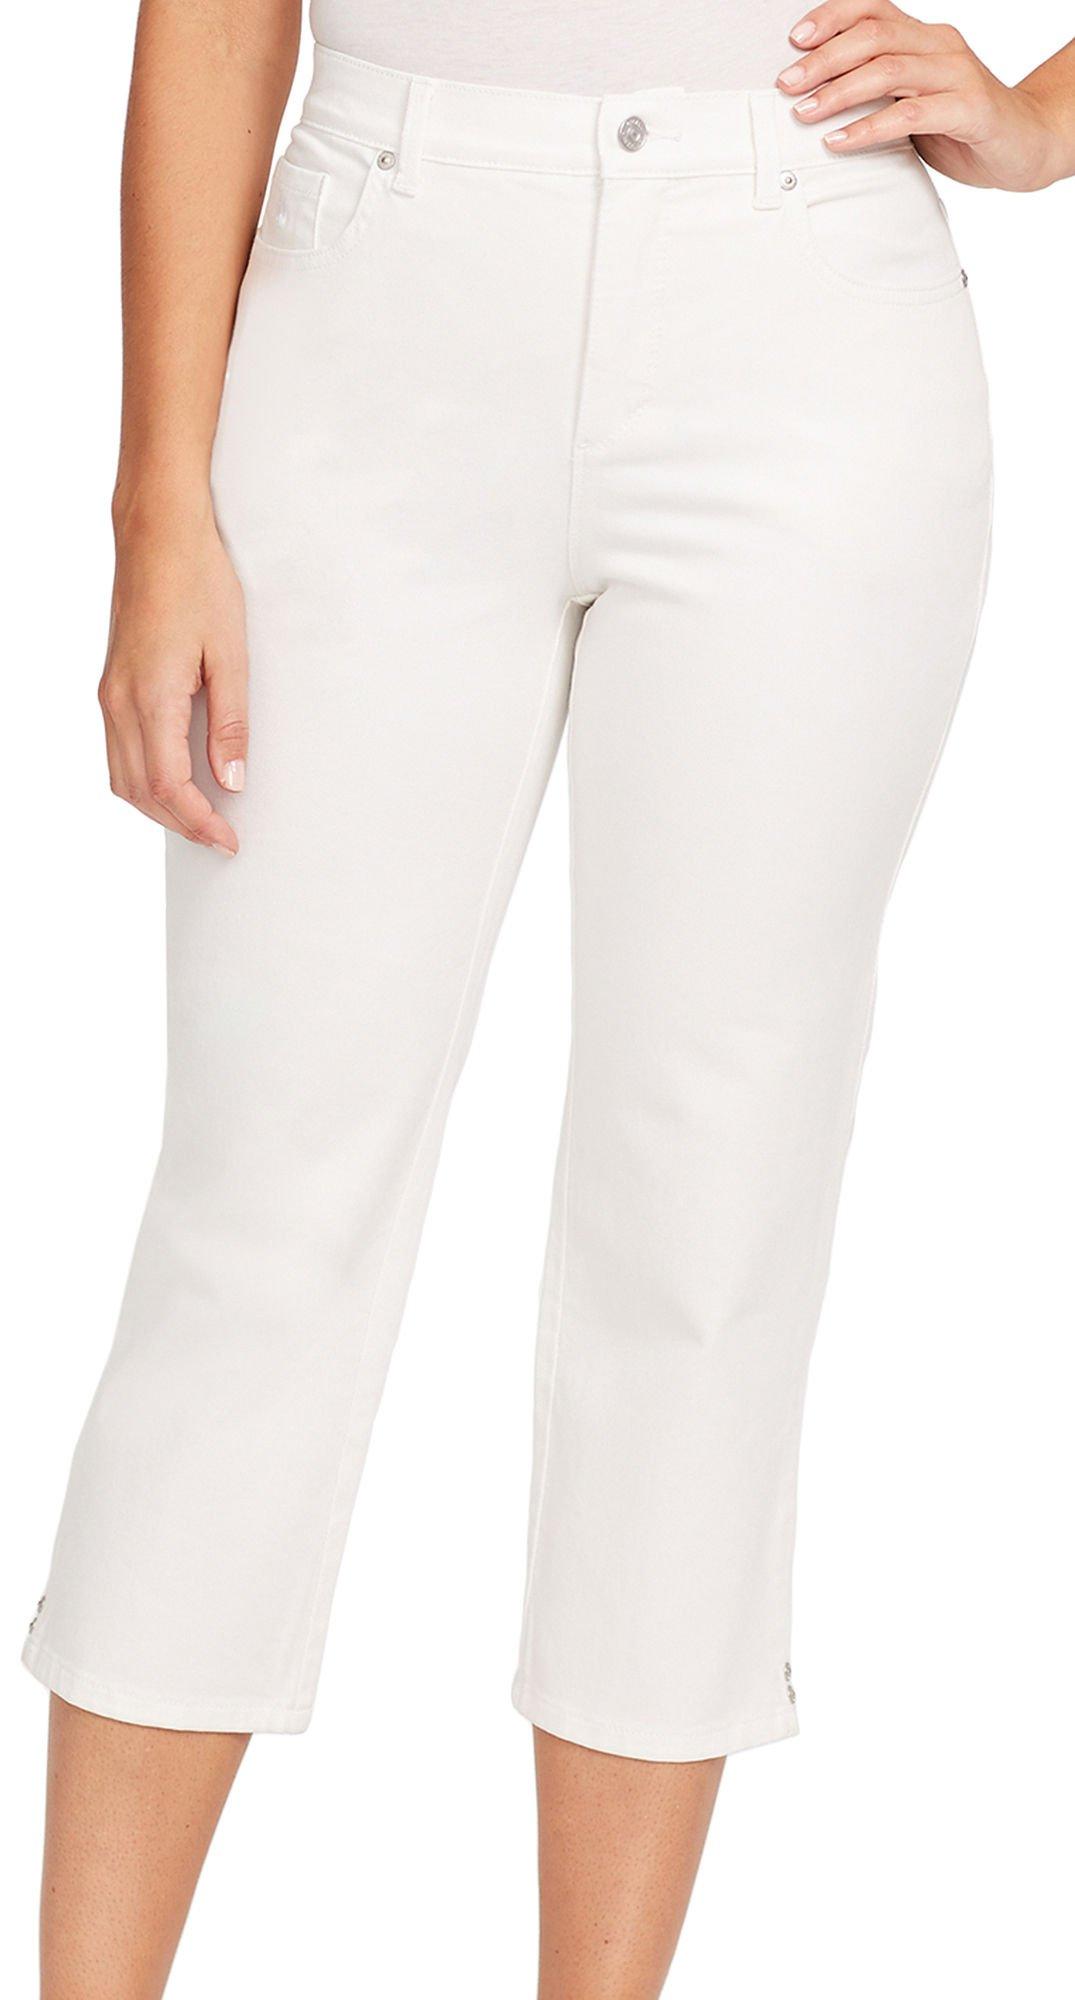 Gloria Vanderbilt Women's Petite Amanda Capri Jeans, Crystal White, 10P